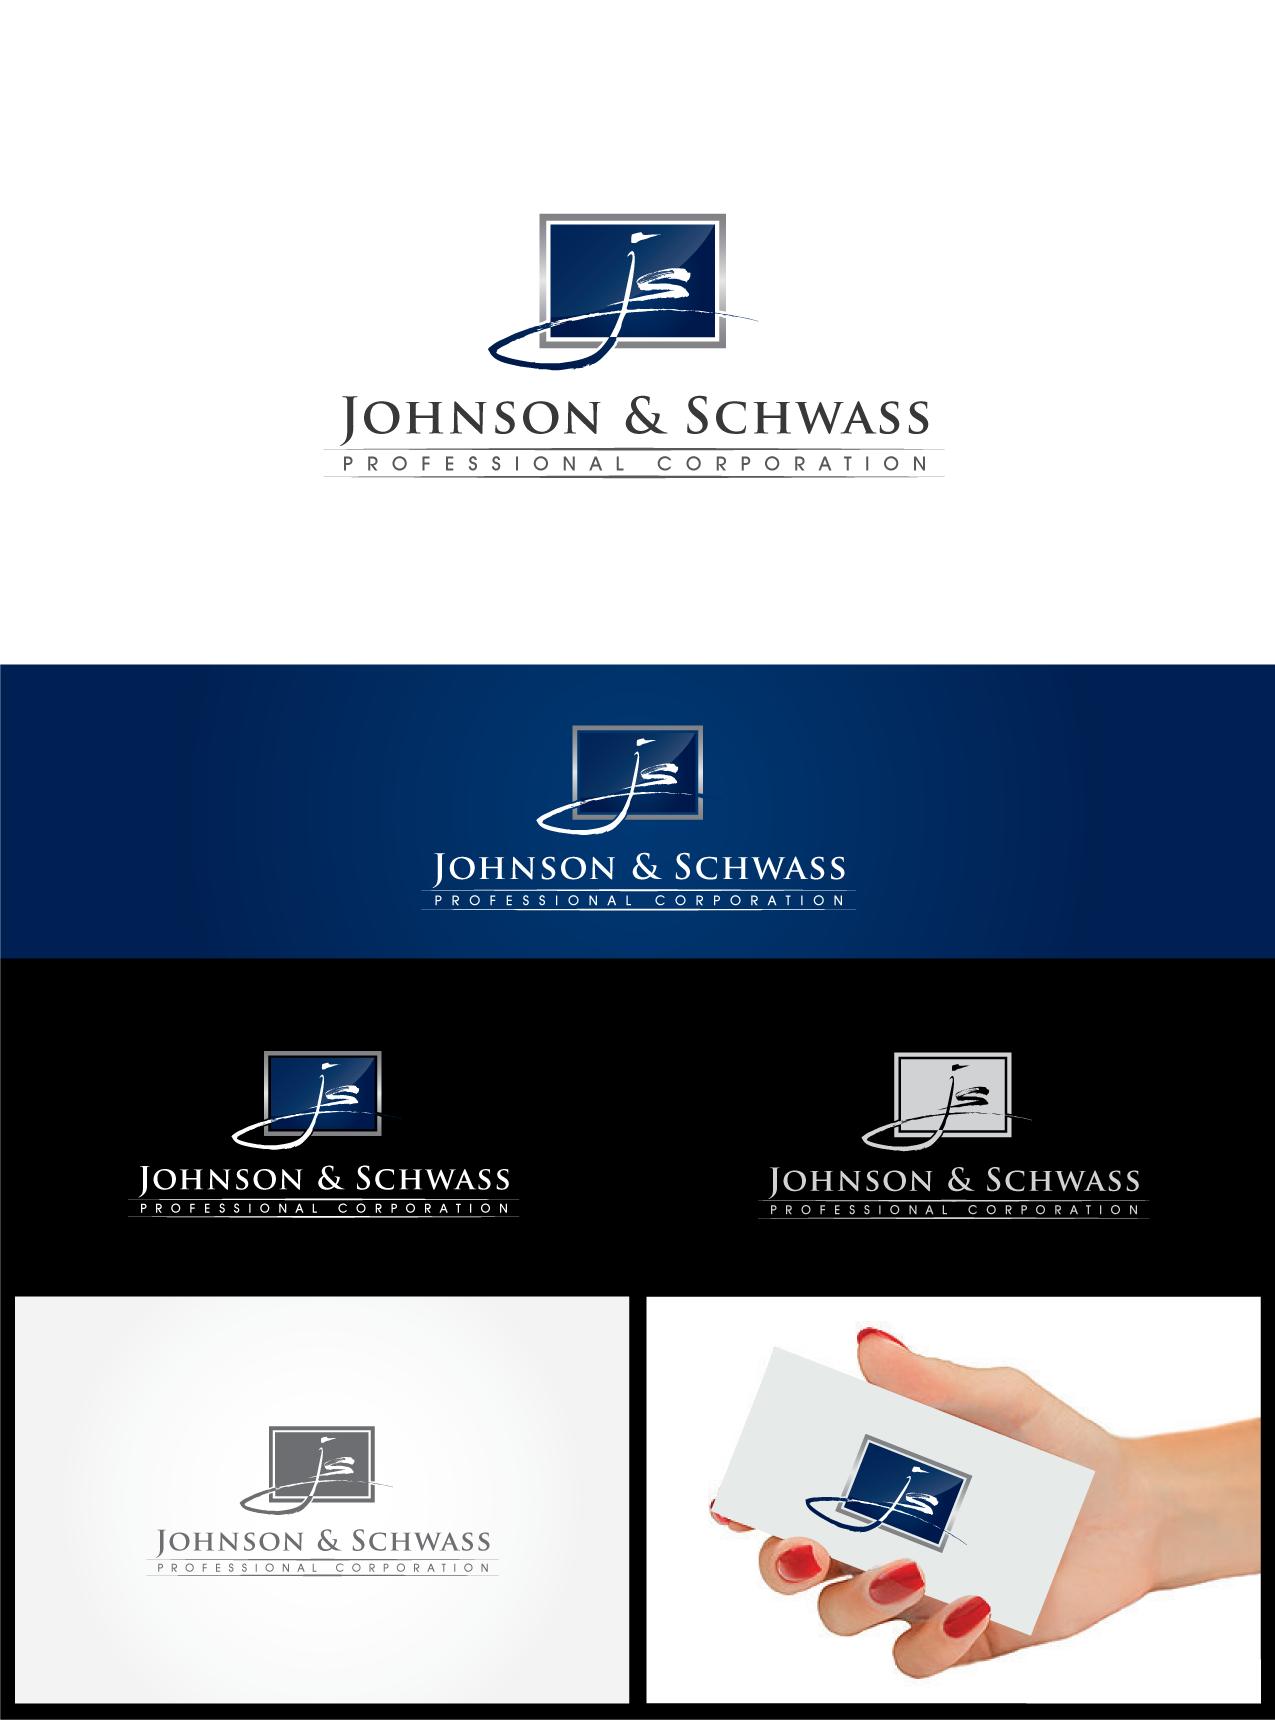 logo for Johnson & Schwass Professional Corporation